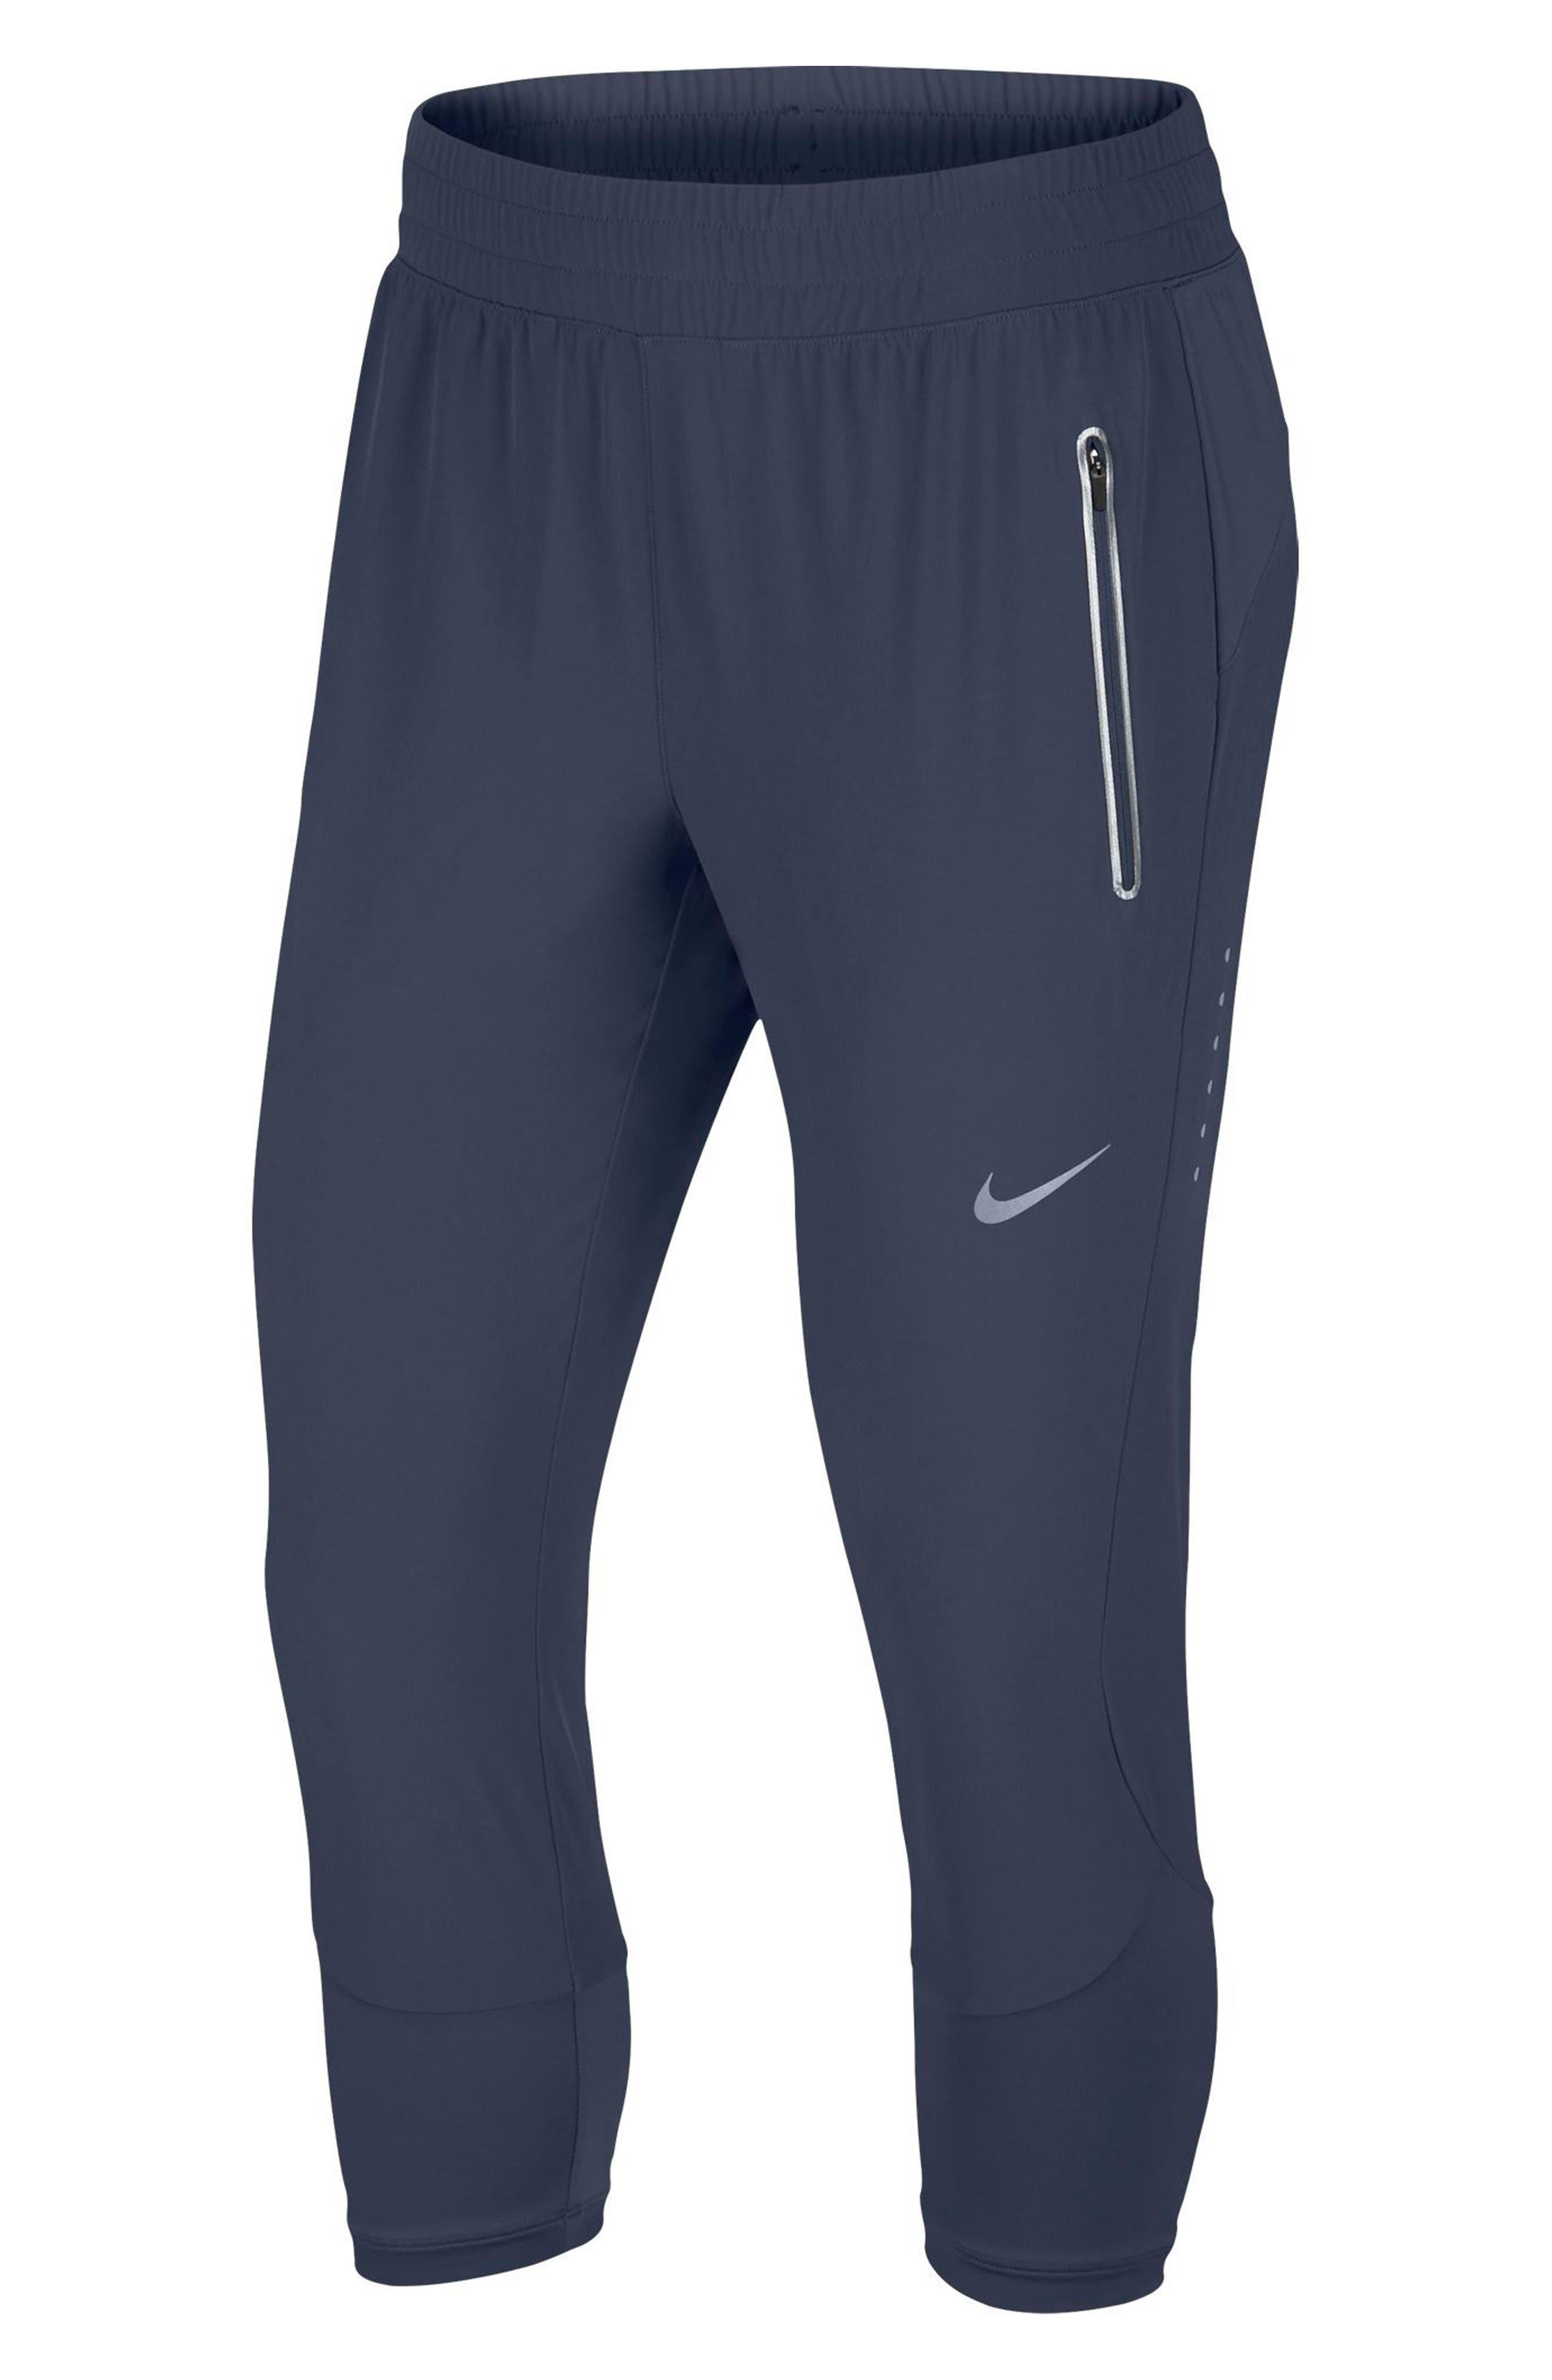 Women's Flex Swift Running Crop Pants,                         Main,                         color, 471